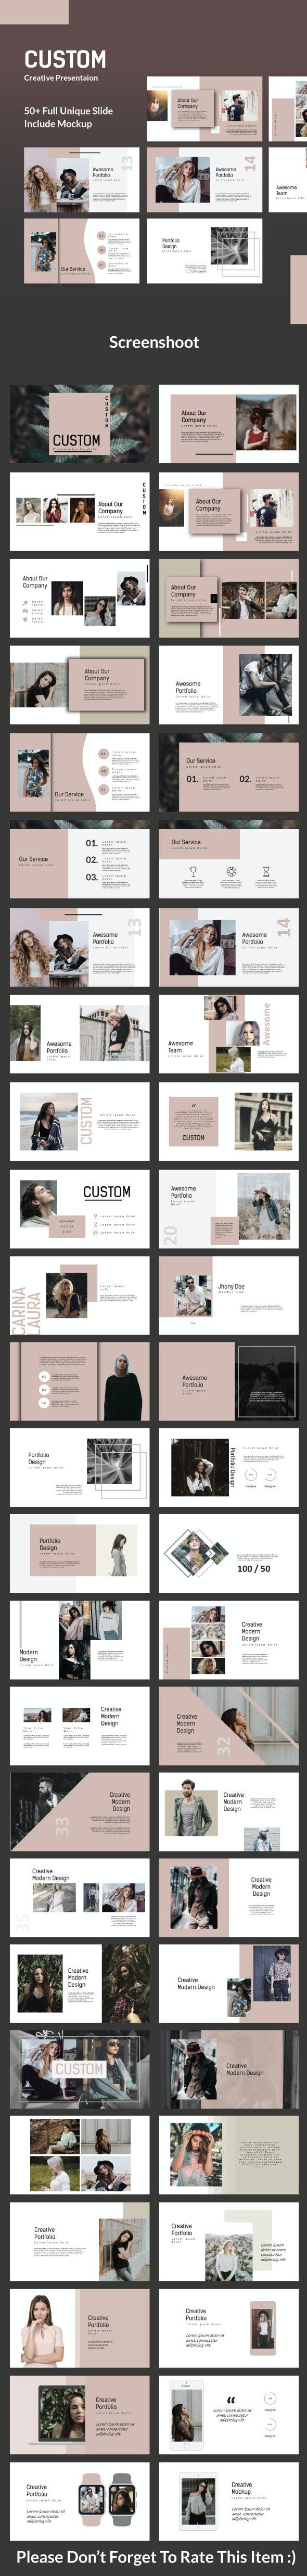 Custom Creative - Powerpoint Template - PowerPoint Templates Presentation Templates